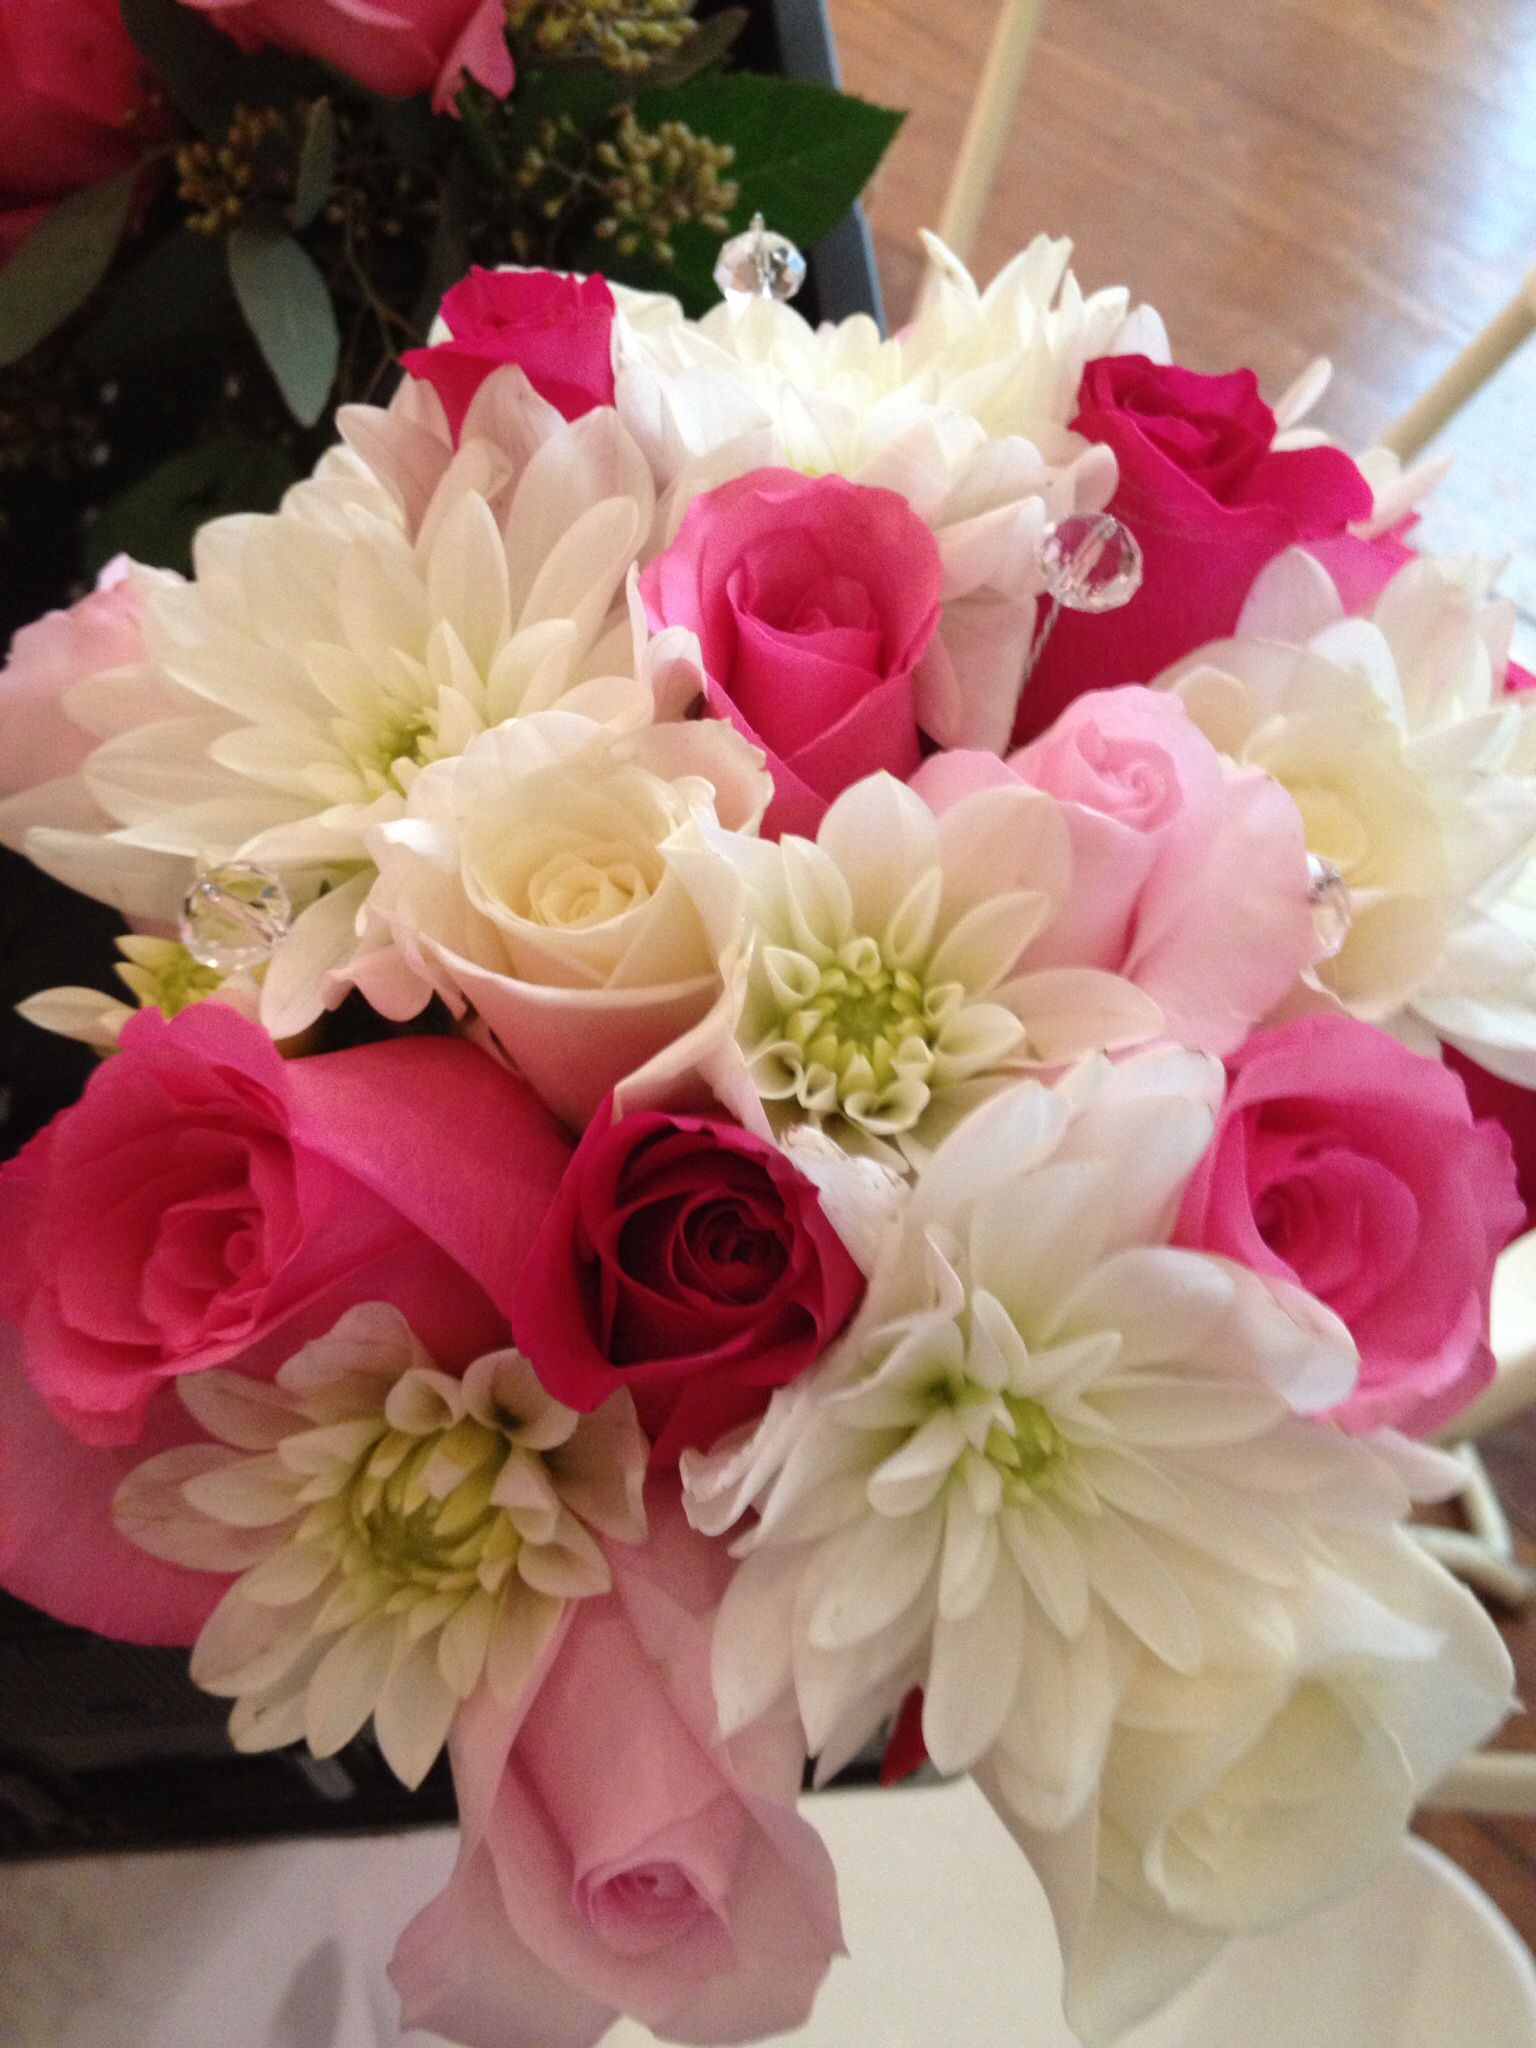 light orlando rises white dahlia hot pink roses escimo roses soulard florist wedding. Black Bedroom Furniture Sets. Home Design Ideas